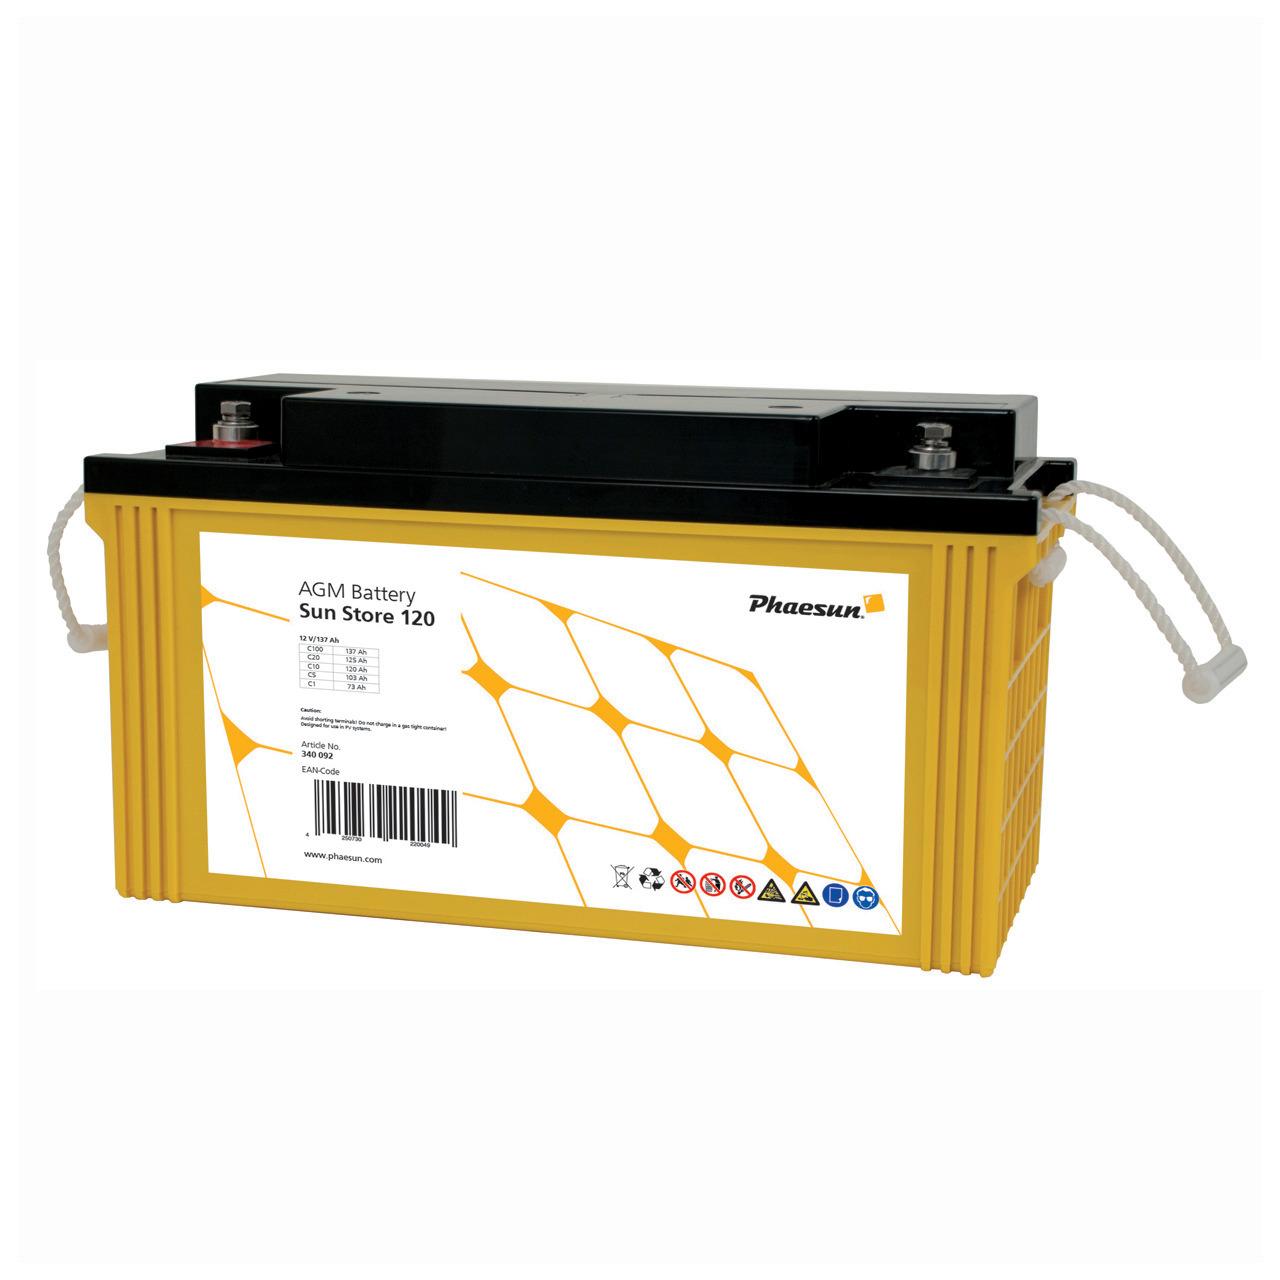 Phaesun Blei-AGM-Akku Sun Store 120- 12 V- 150 Ah